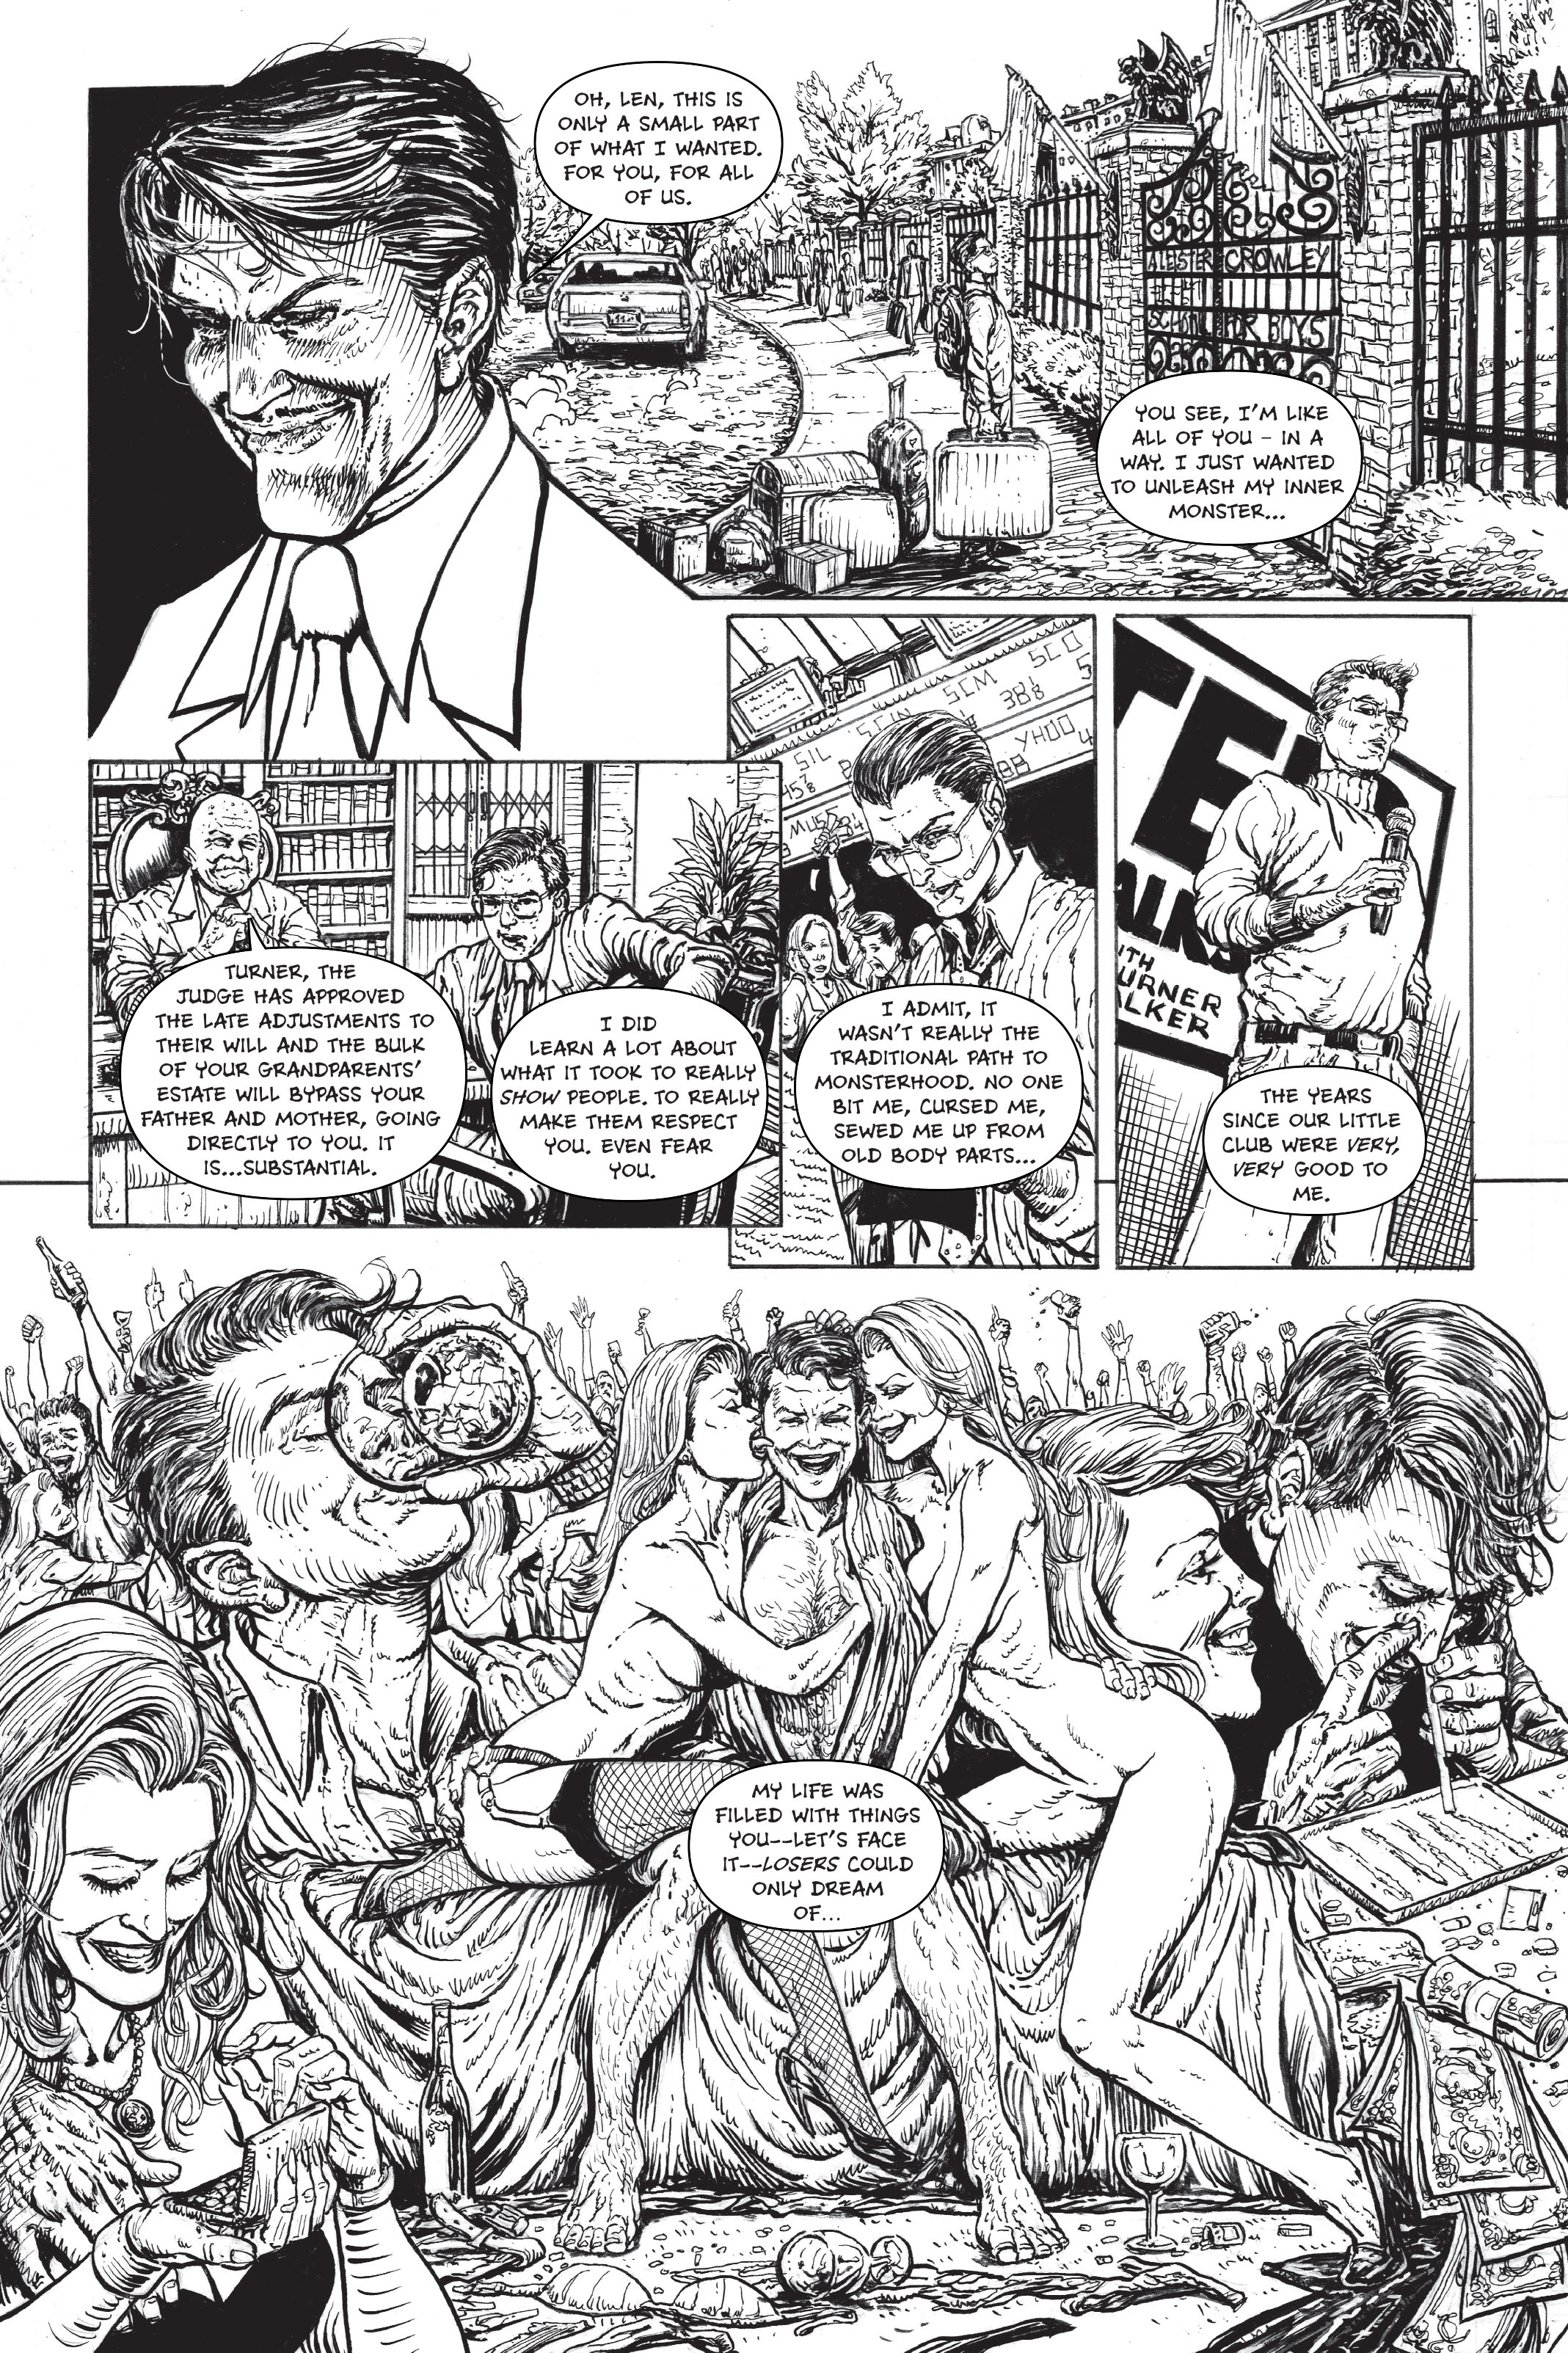 MC page 008.jpg